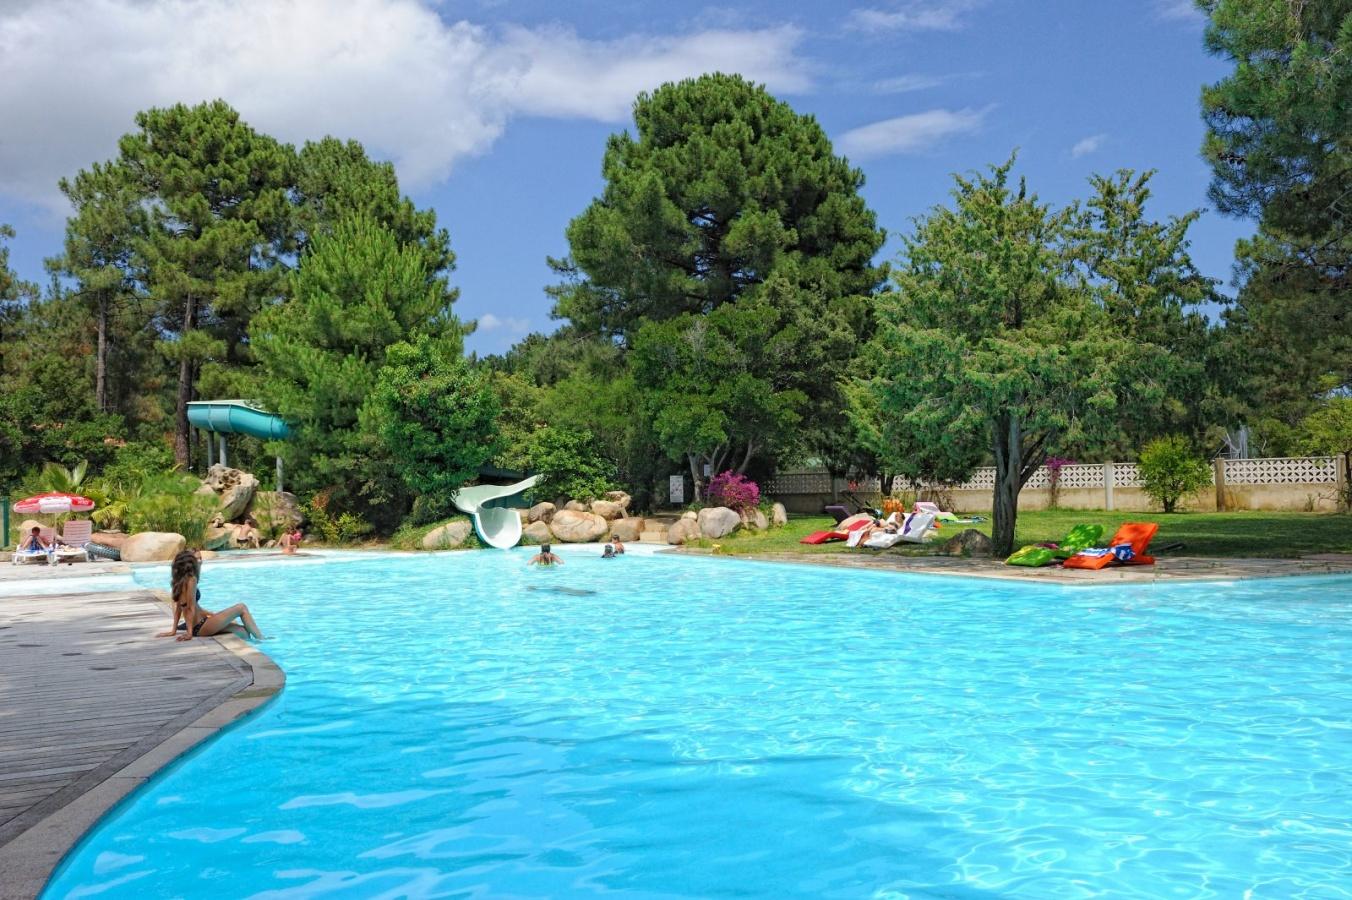 Camping u mulinacciu corse france espace aquatique for Camping corse bastia avec piscine